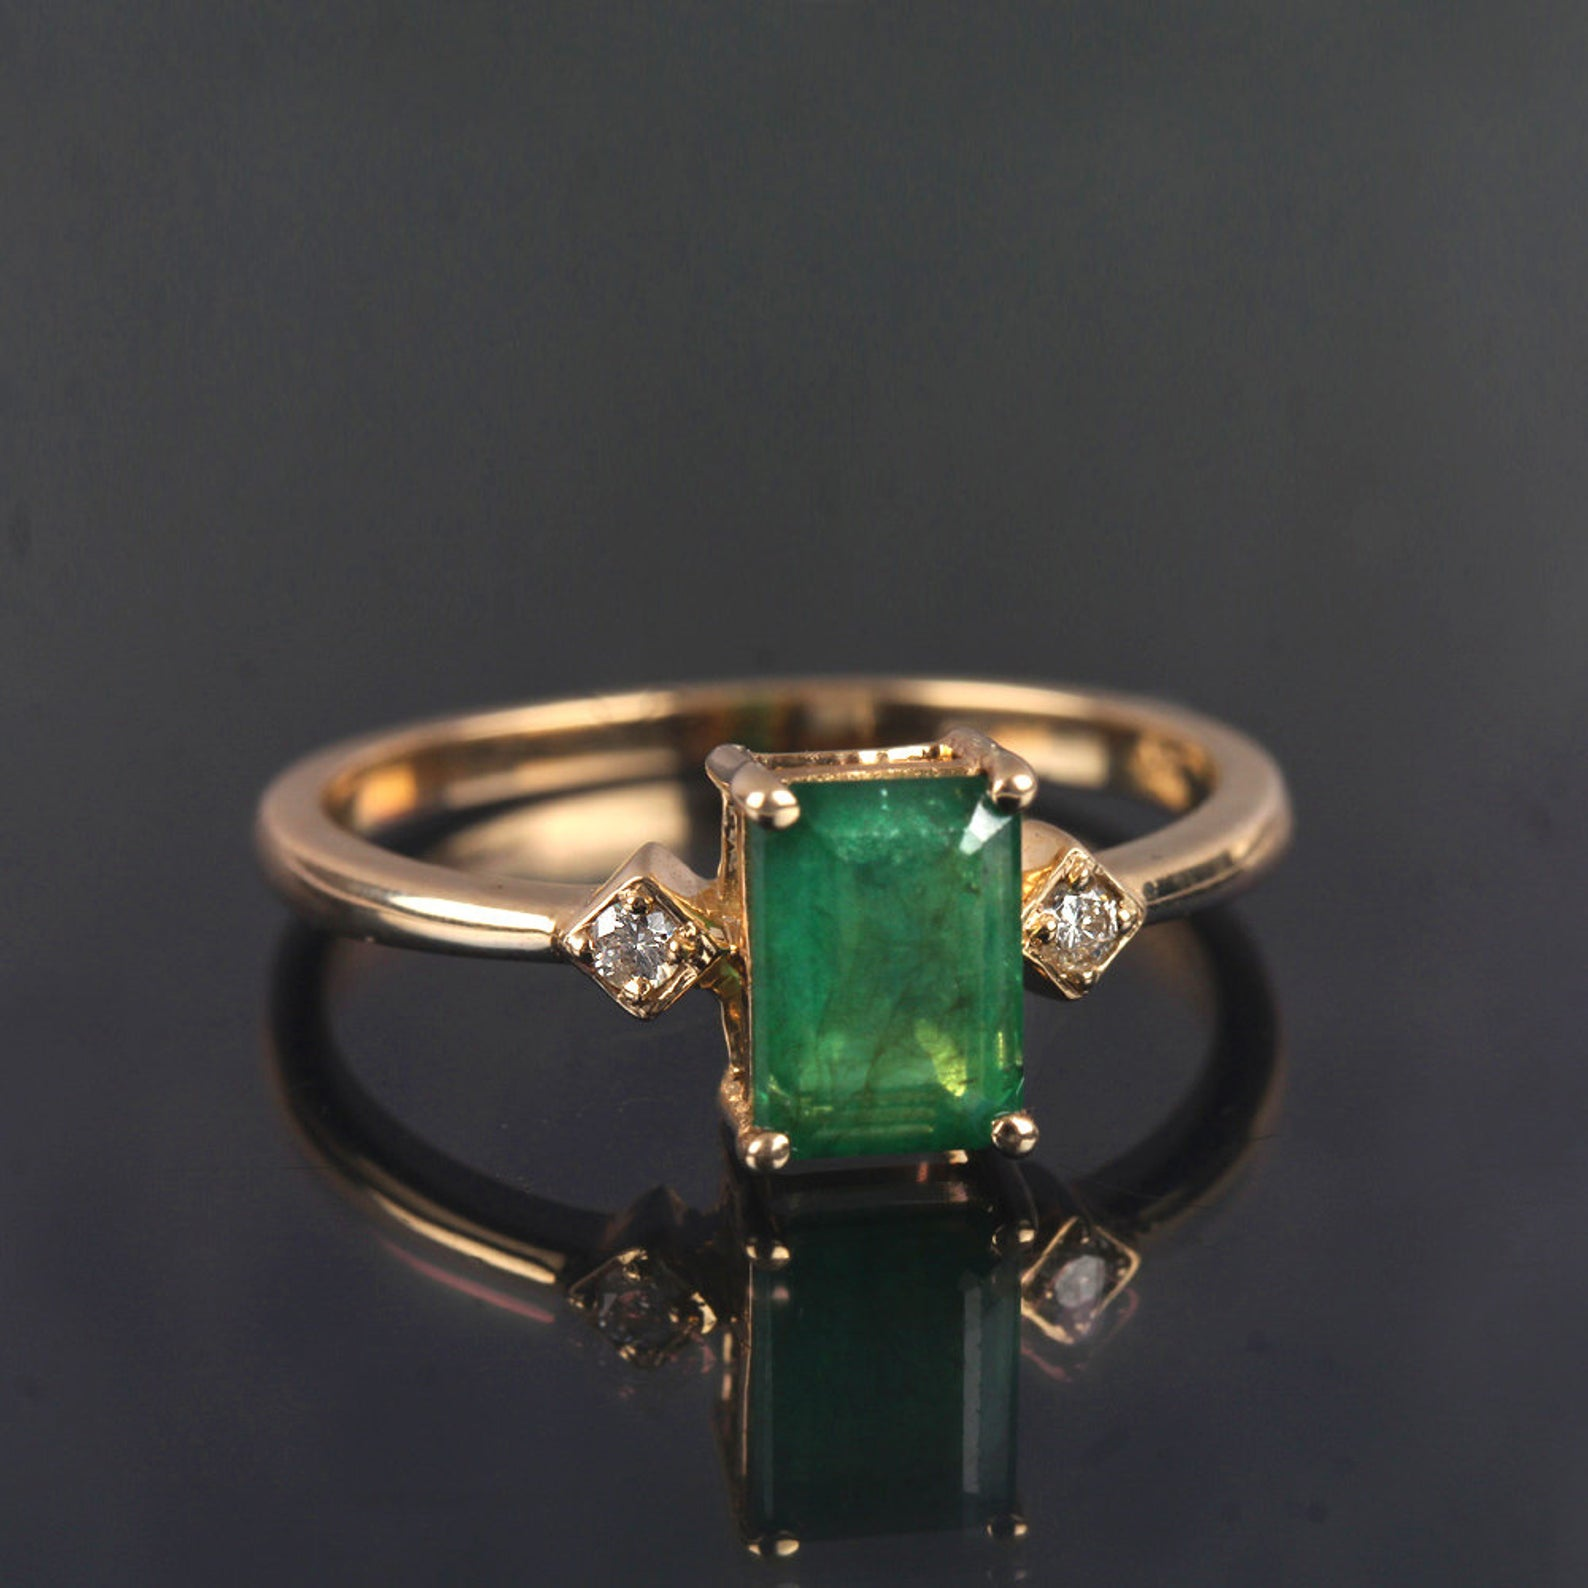 Natural Emerald Gemstone Engagement Ring